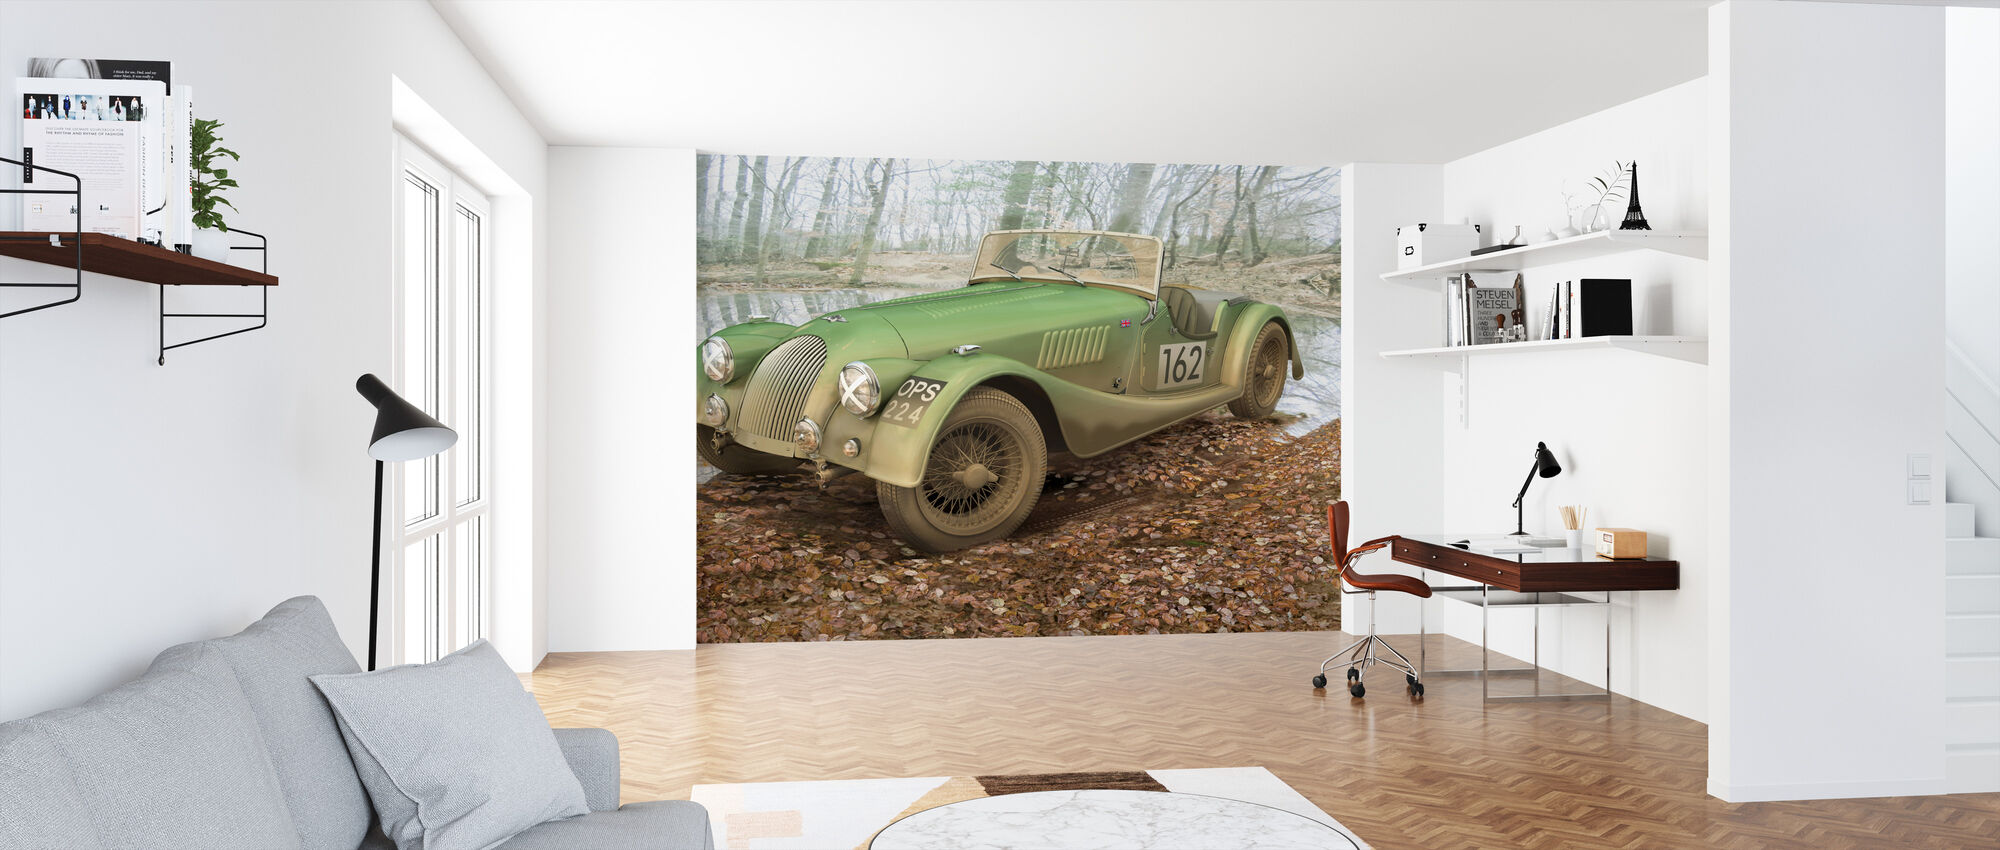 British Sports Car Autumn - Wallpaper - Office